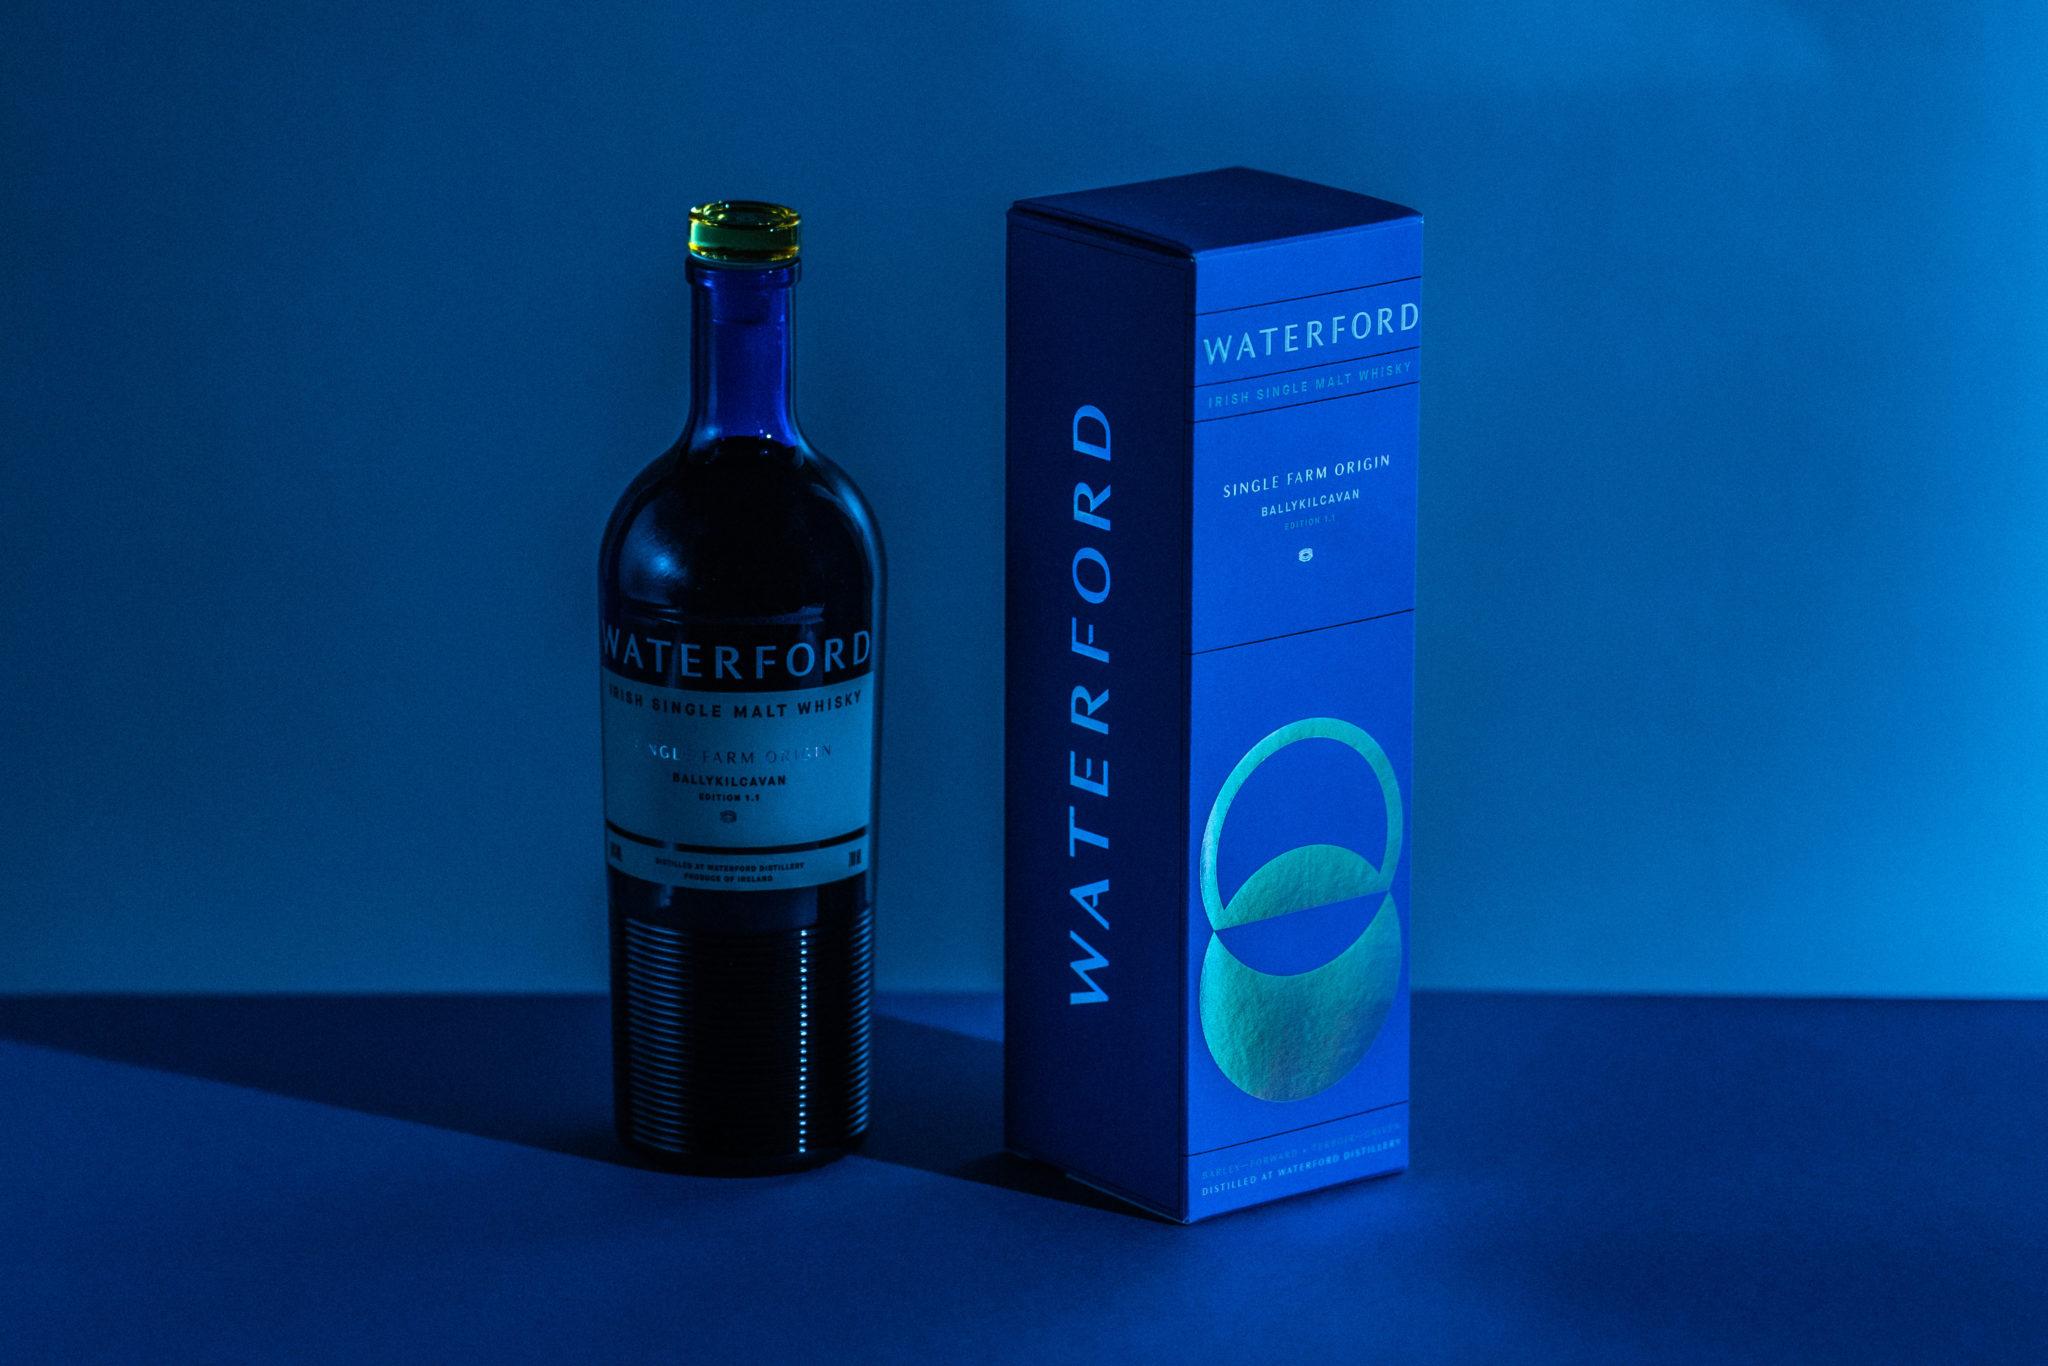 WD-Product-Misc-Box-Bottle-Ballykilcavan-WEB-5-2048x1366